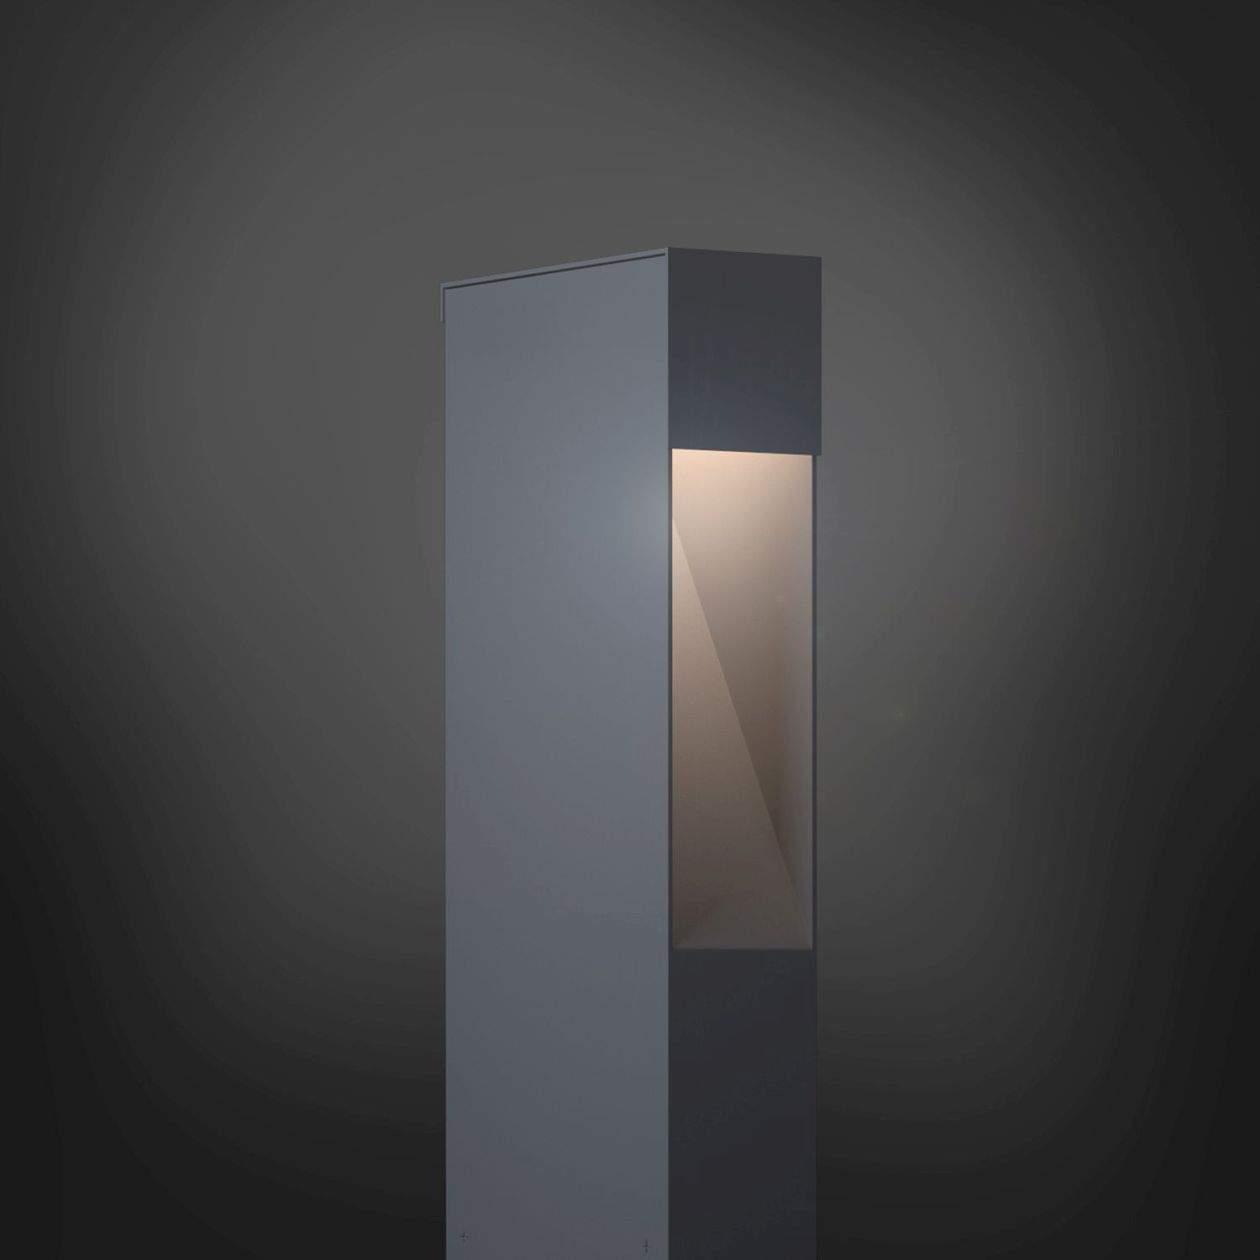 Leuchte Design Aussenleuchte Lampe Medium Focus Grau 1